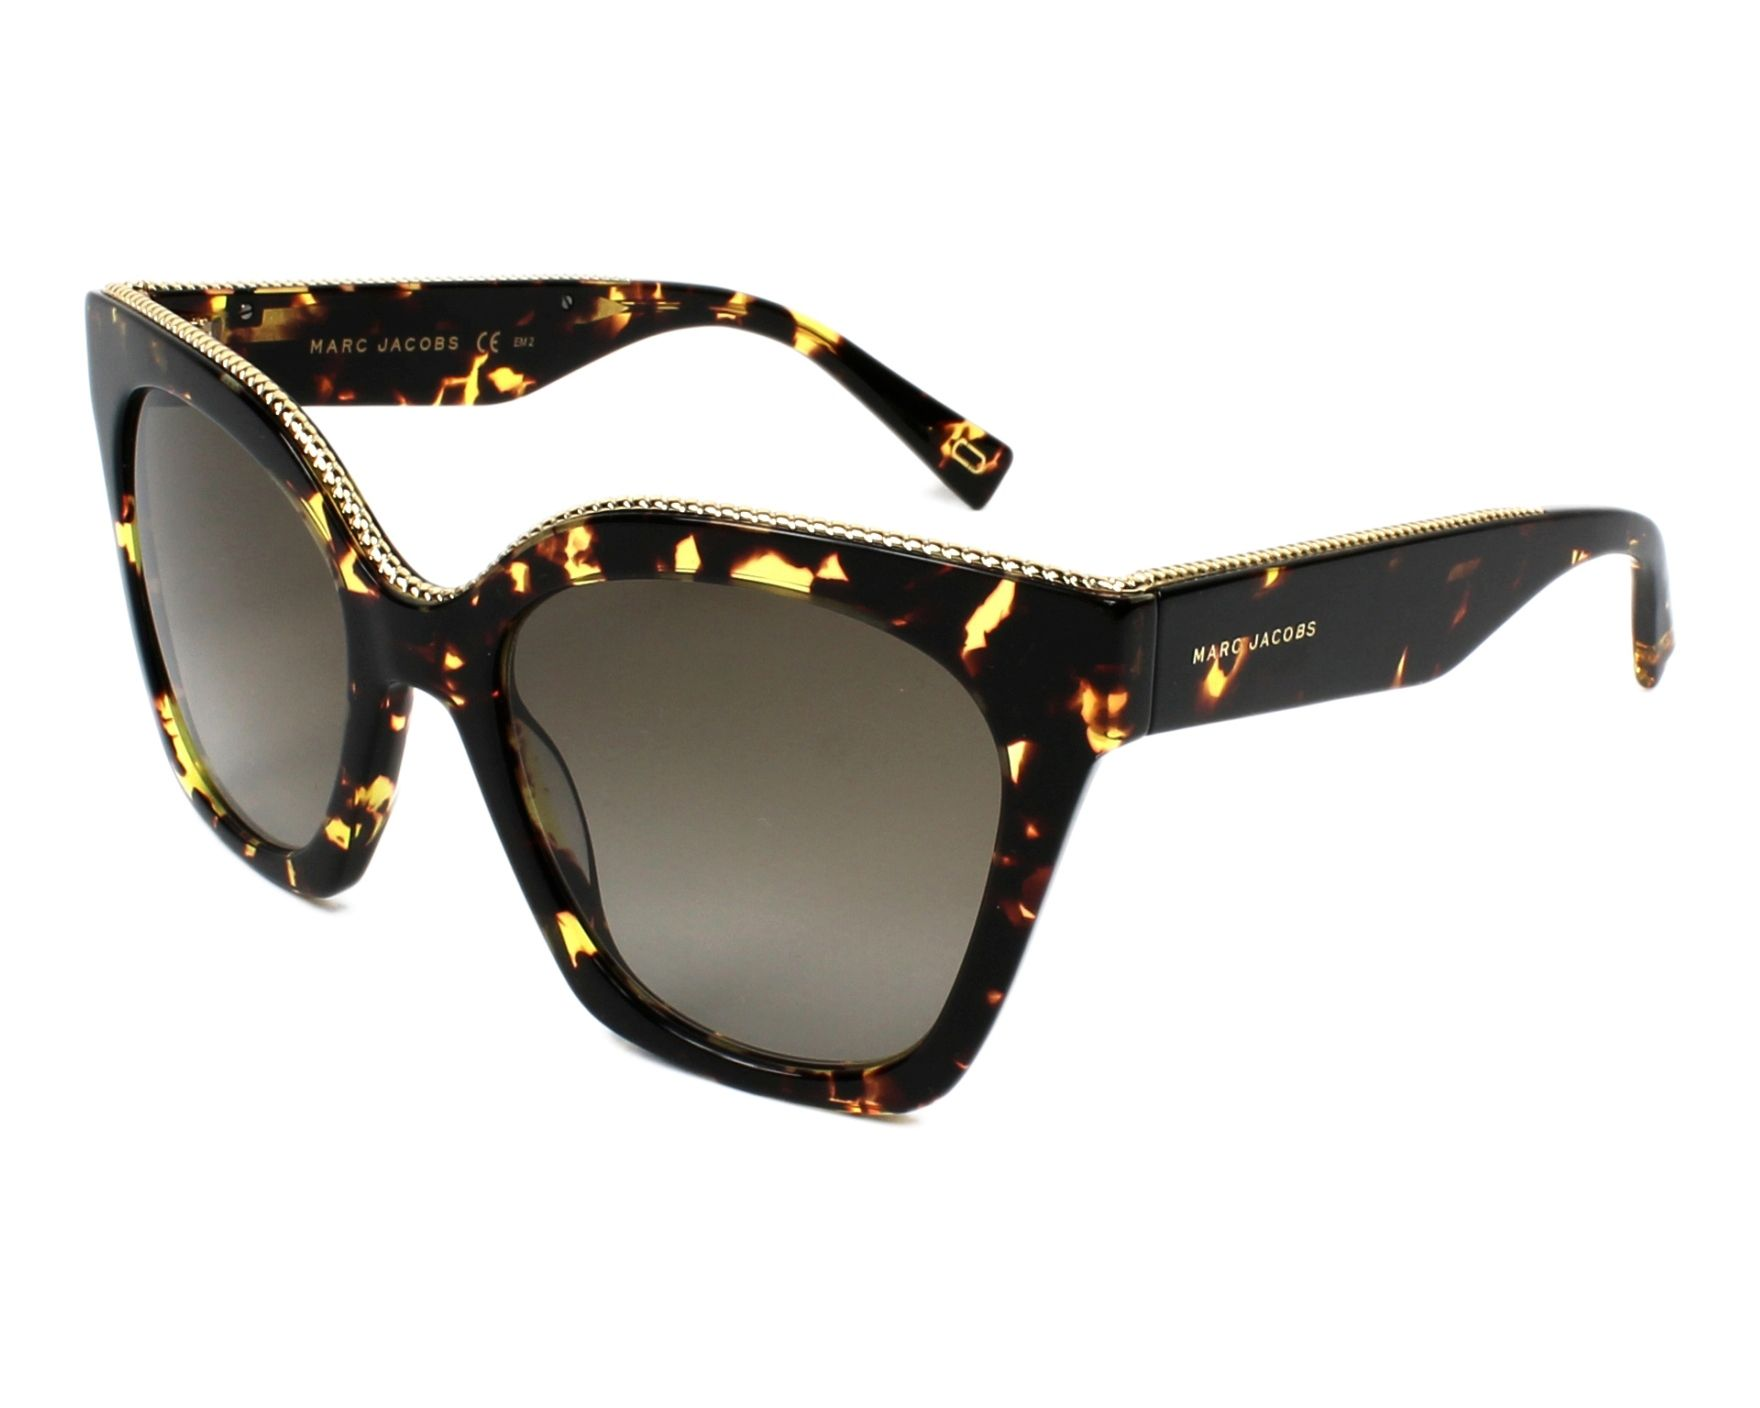 7f80e275bc6b4 Sunglasses Marc Jacobs MARC-162-S 086 HA 52-19 Havana Gold